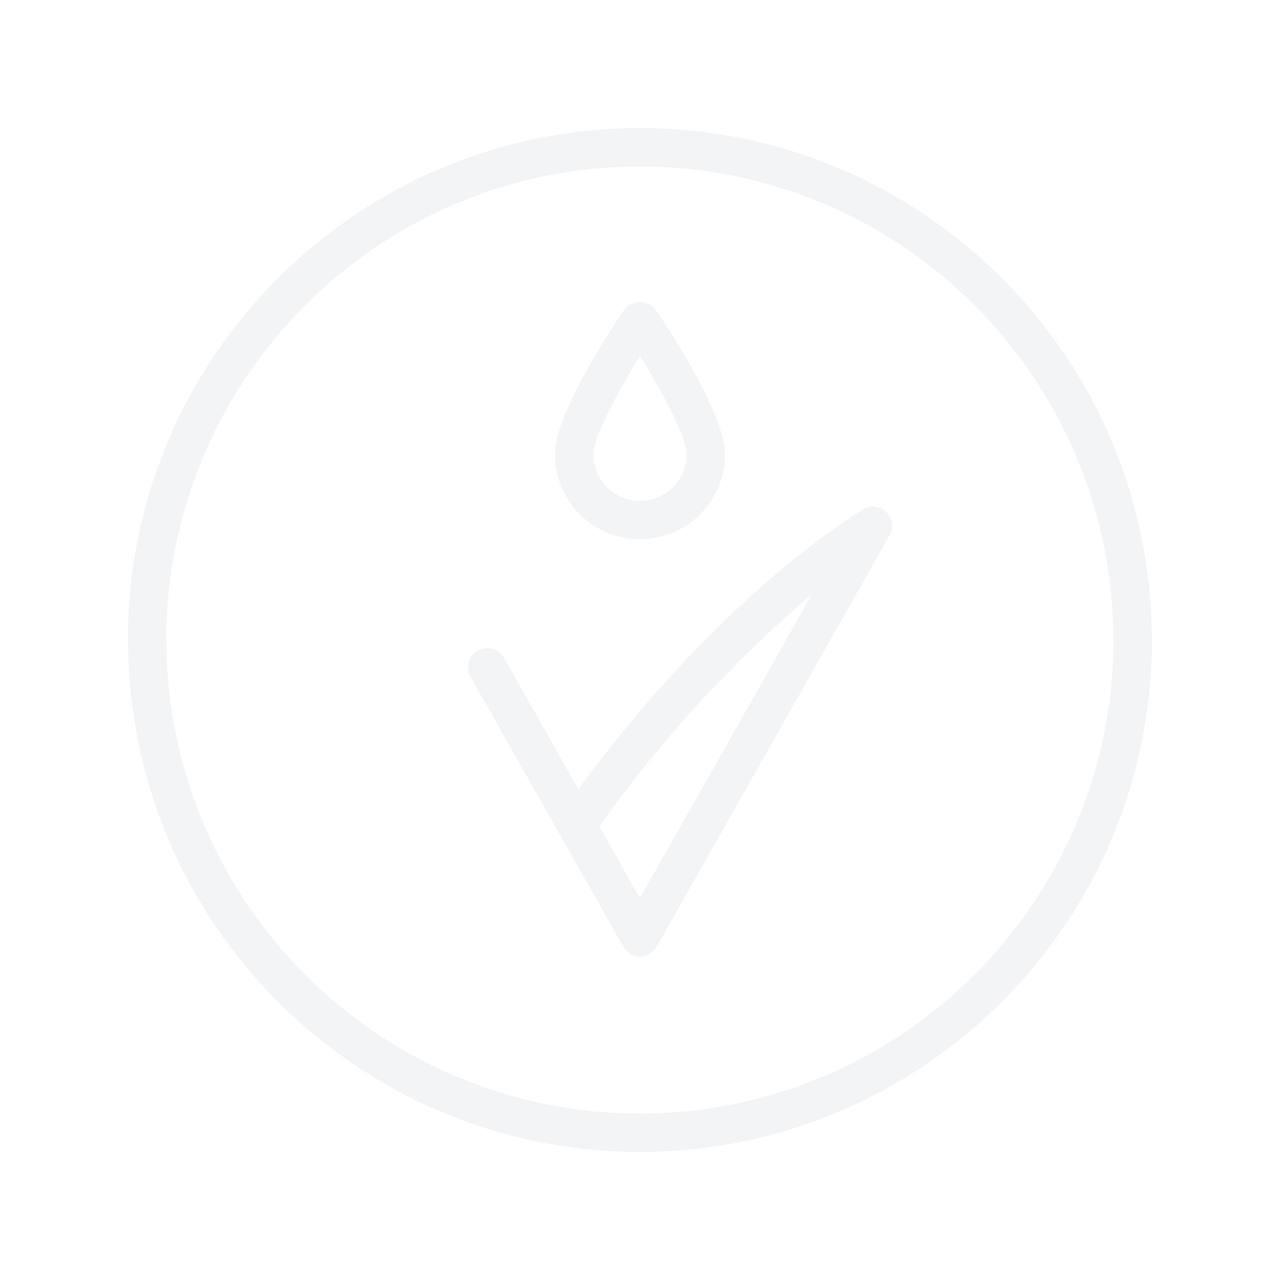 TURBLISS Deeply Hydrating Peat Mask 60ml